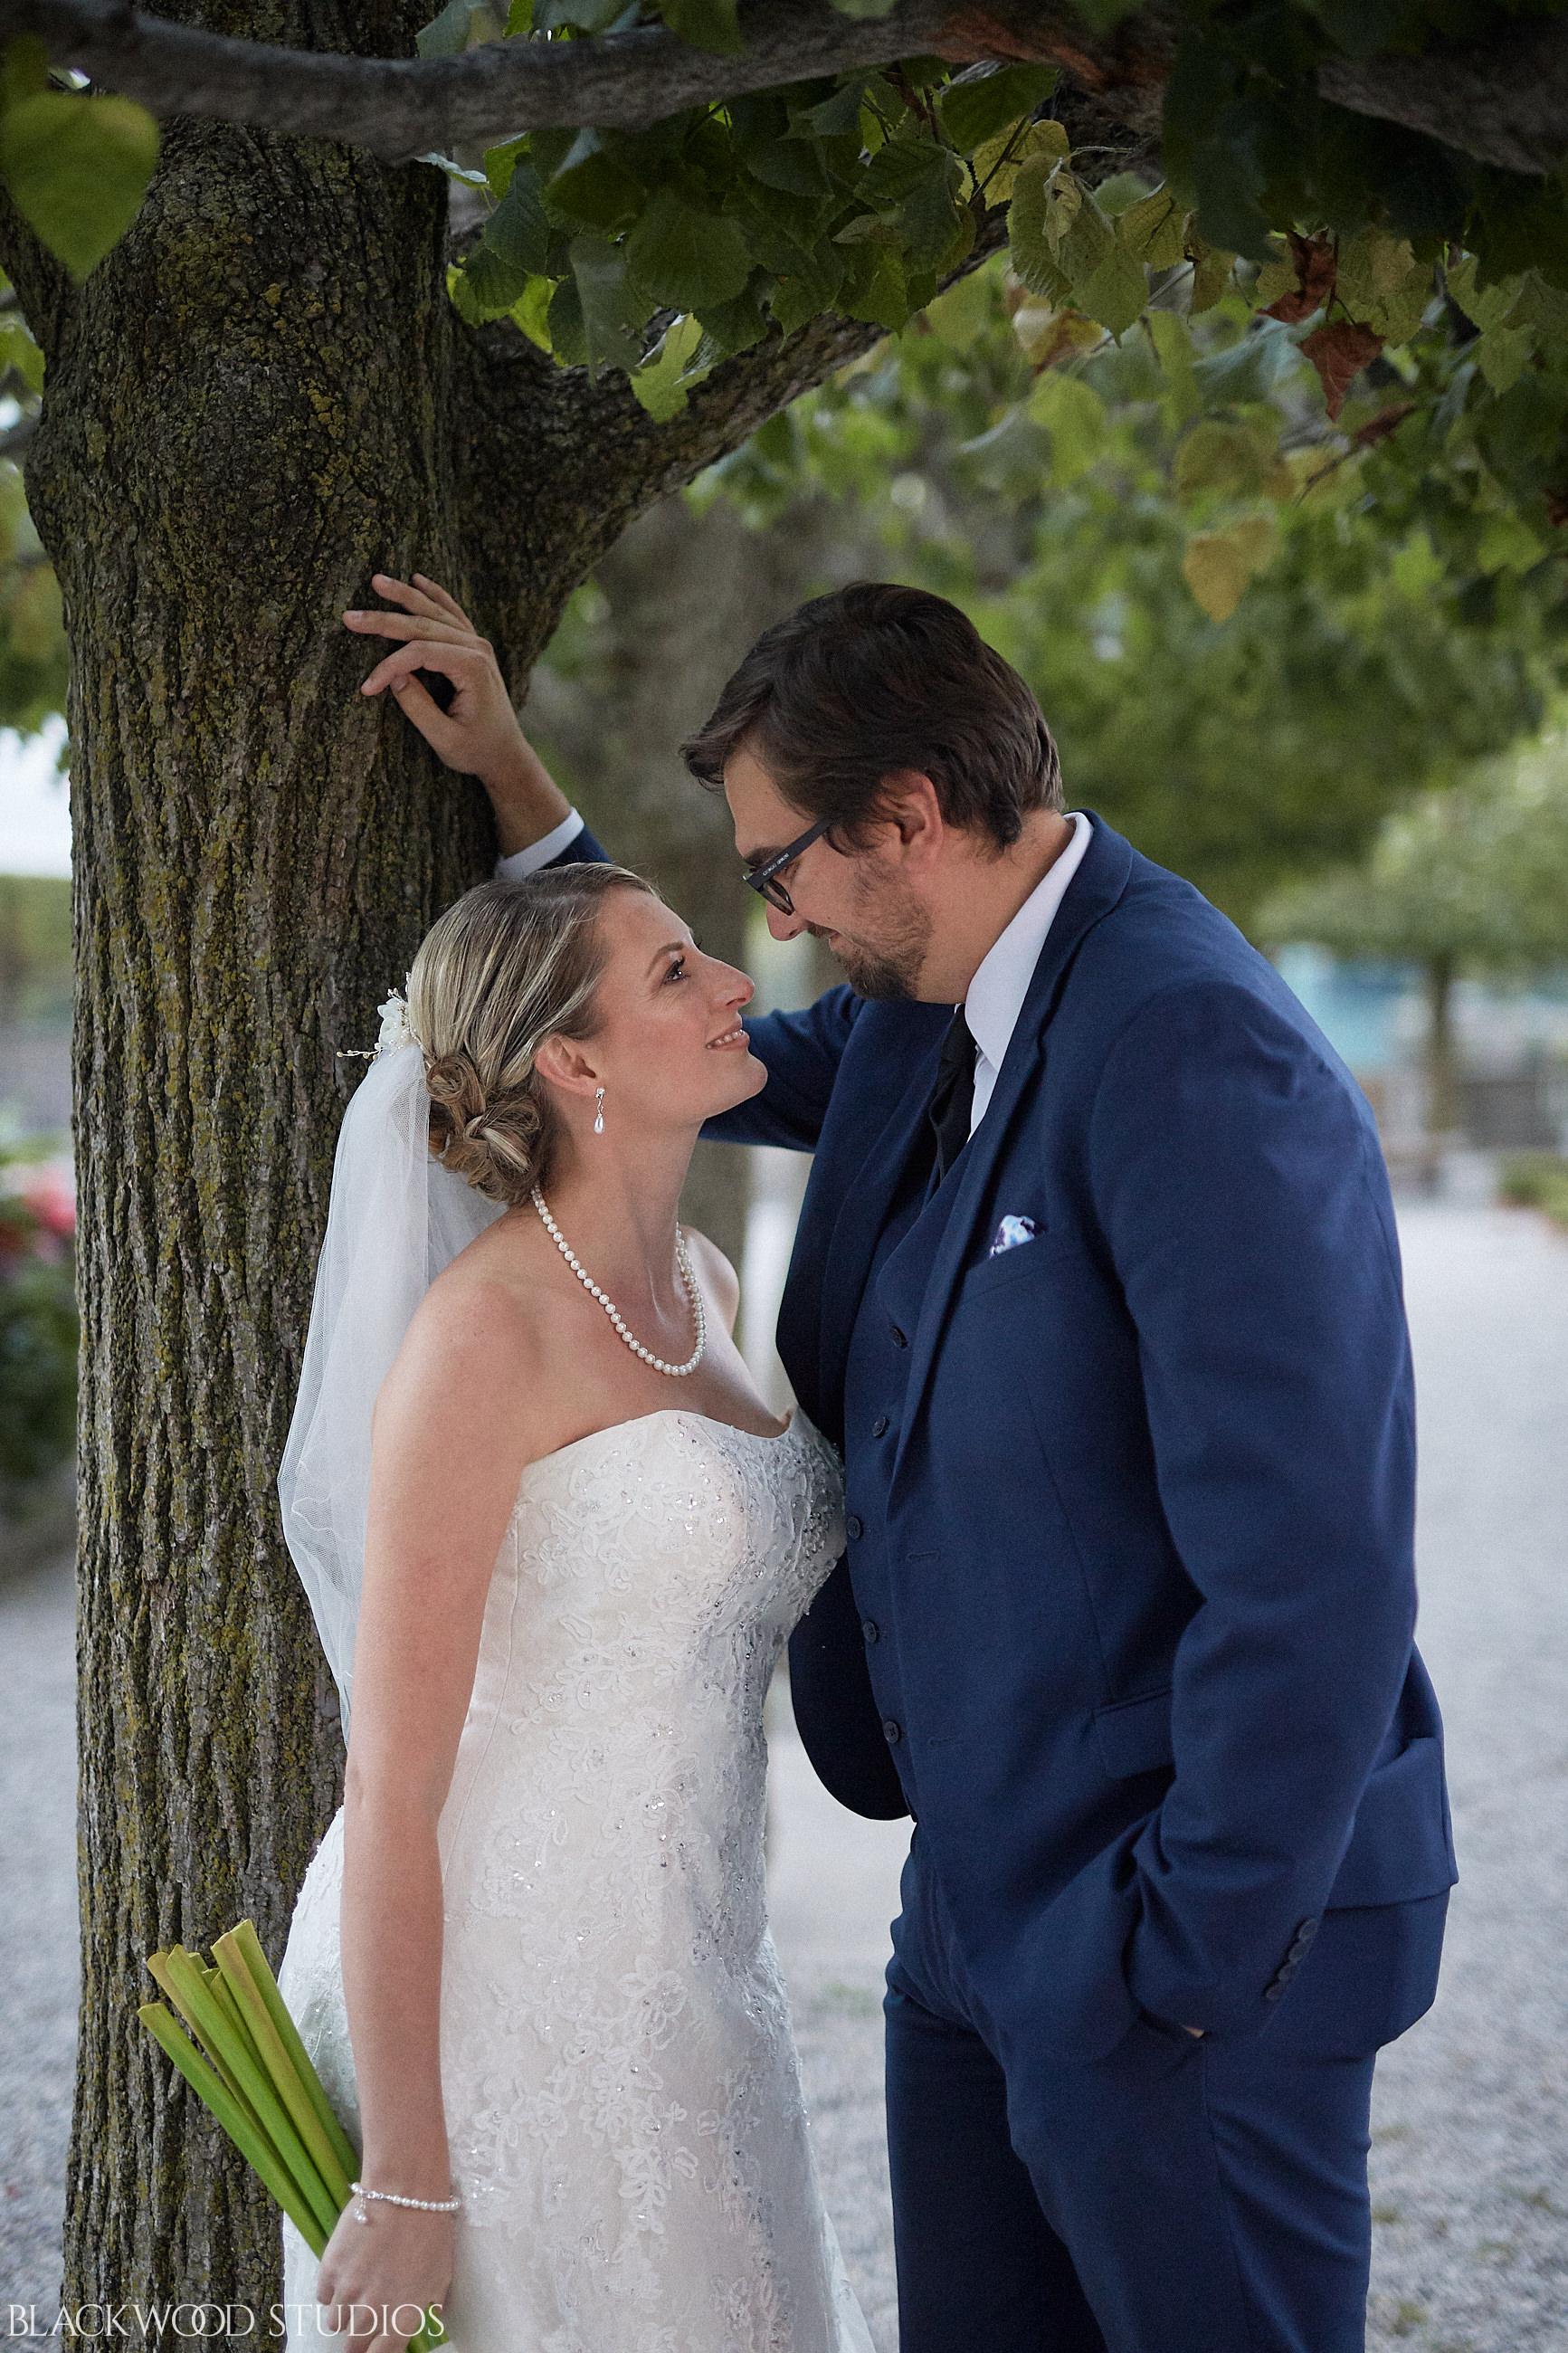 Blackwood-Studios-Wedding-Photography-20170928-185749-Marek-Katie-Michalek-Oakes-Garden-Theatre-Niagara-Falls-Ontario-Canada.jpg